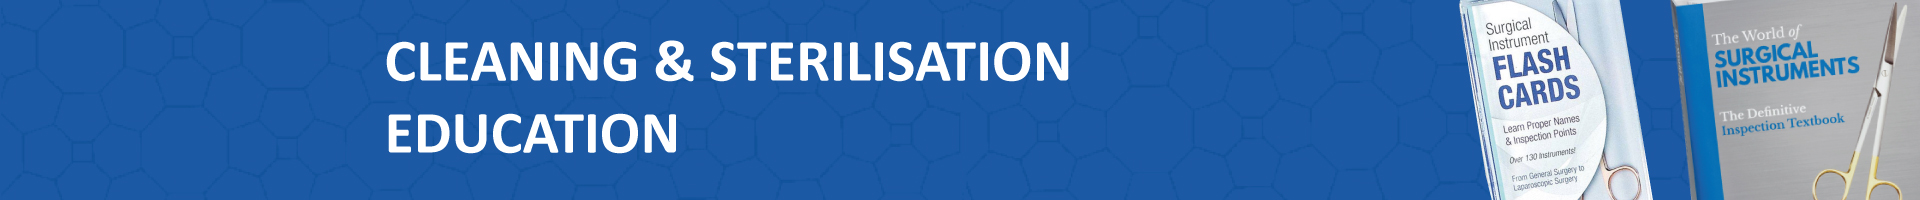 banner-cleaning-sterilisation-education